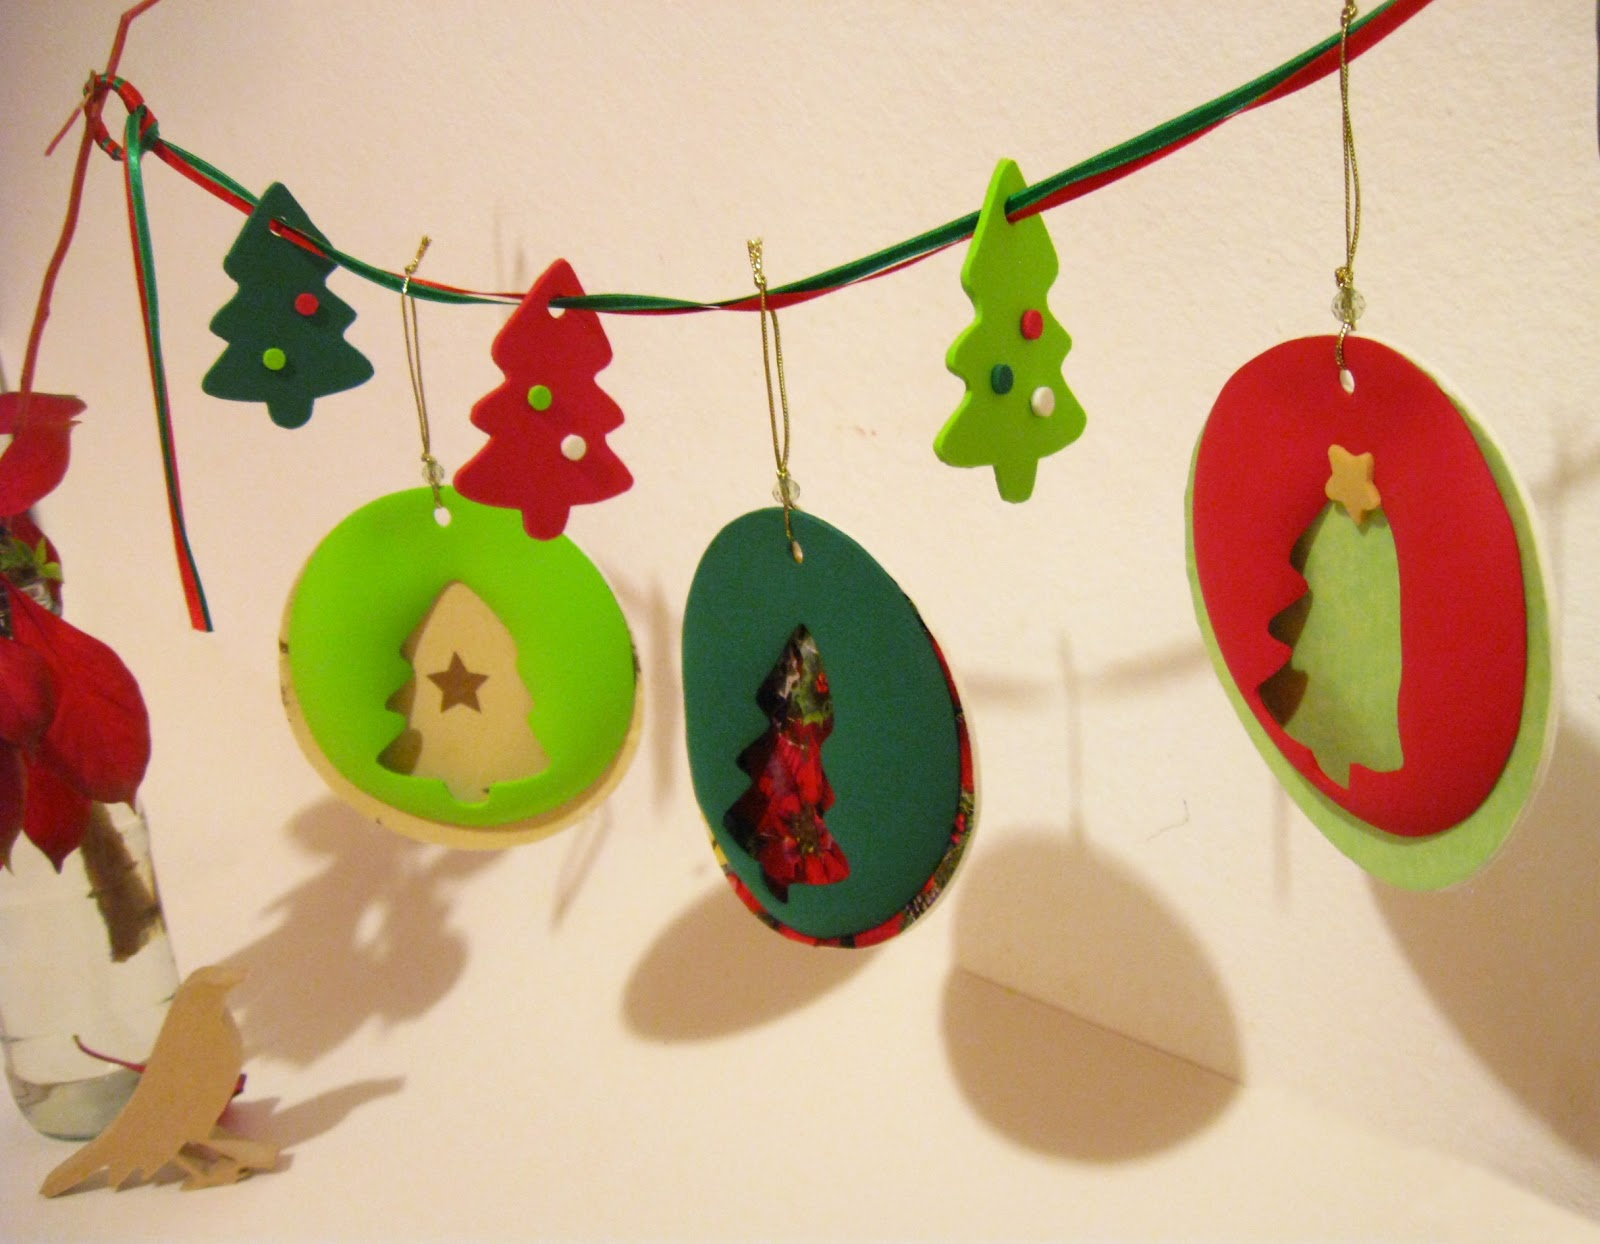 Pinterest Adornos De Navidad Pinterest Adornos De Navidad With - Adornos-navidad-infantiles